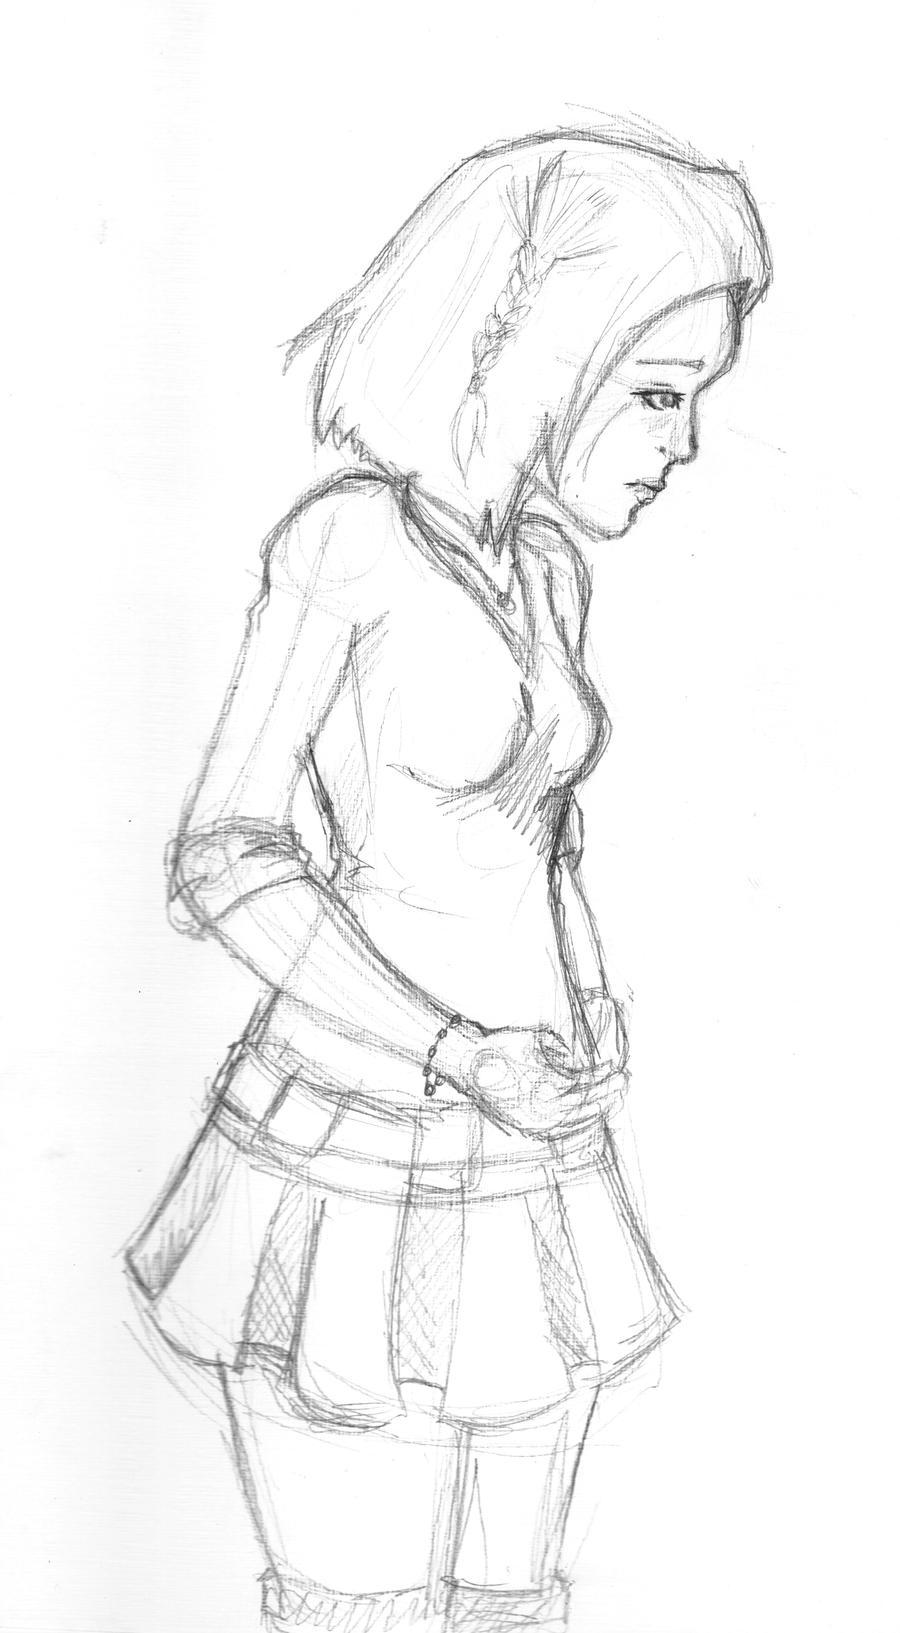 Sad Girl by michichibi on DeviantArt